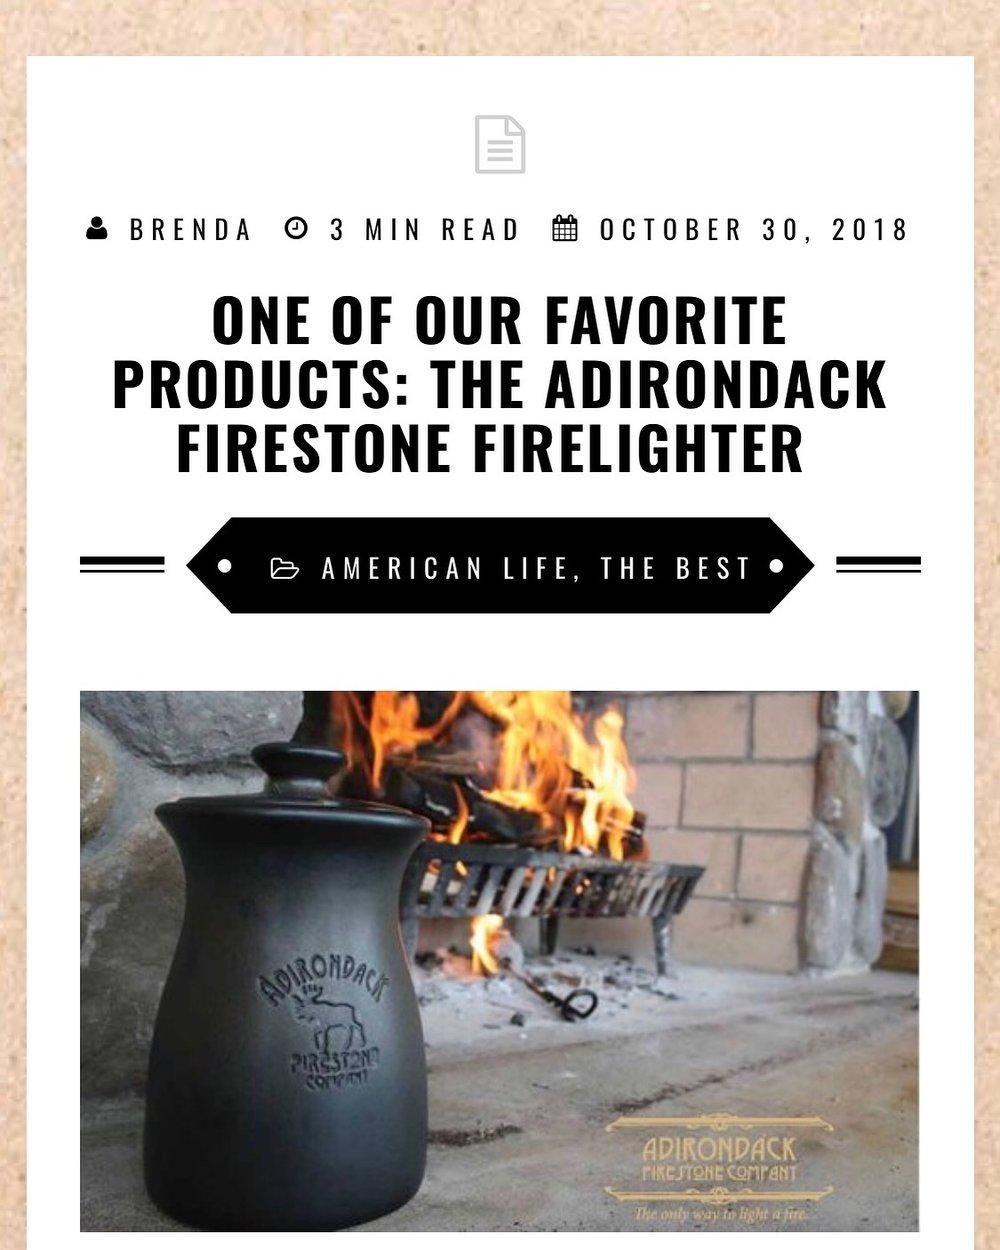 Bed and Breakfast establishments love using their Adirondack Firestone Firelighters!